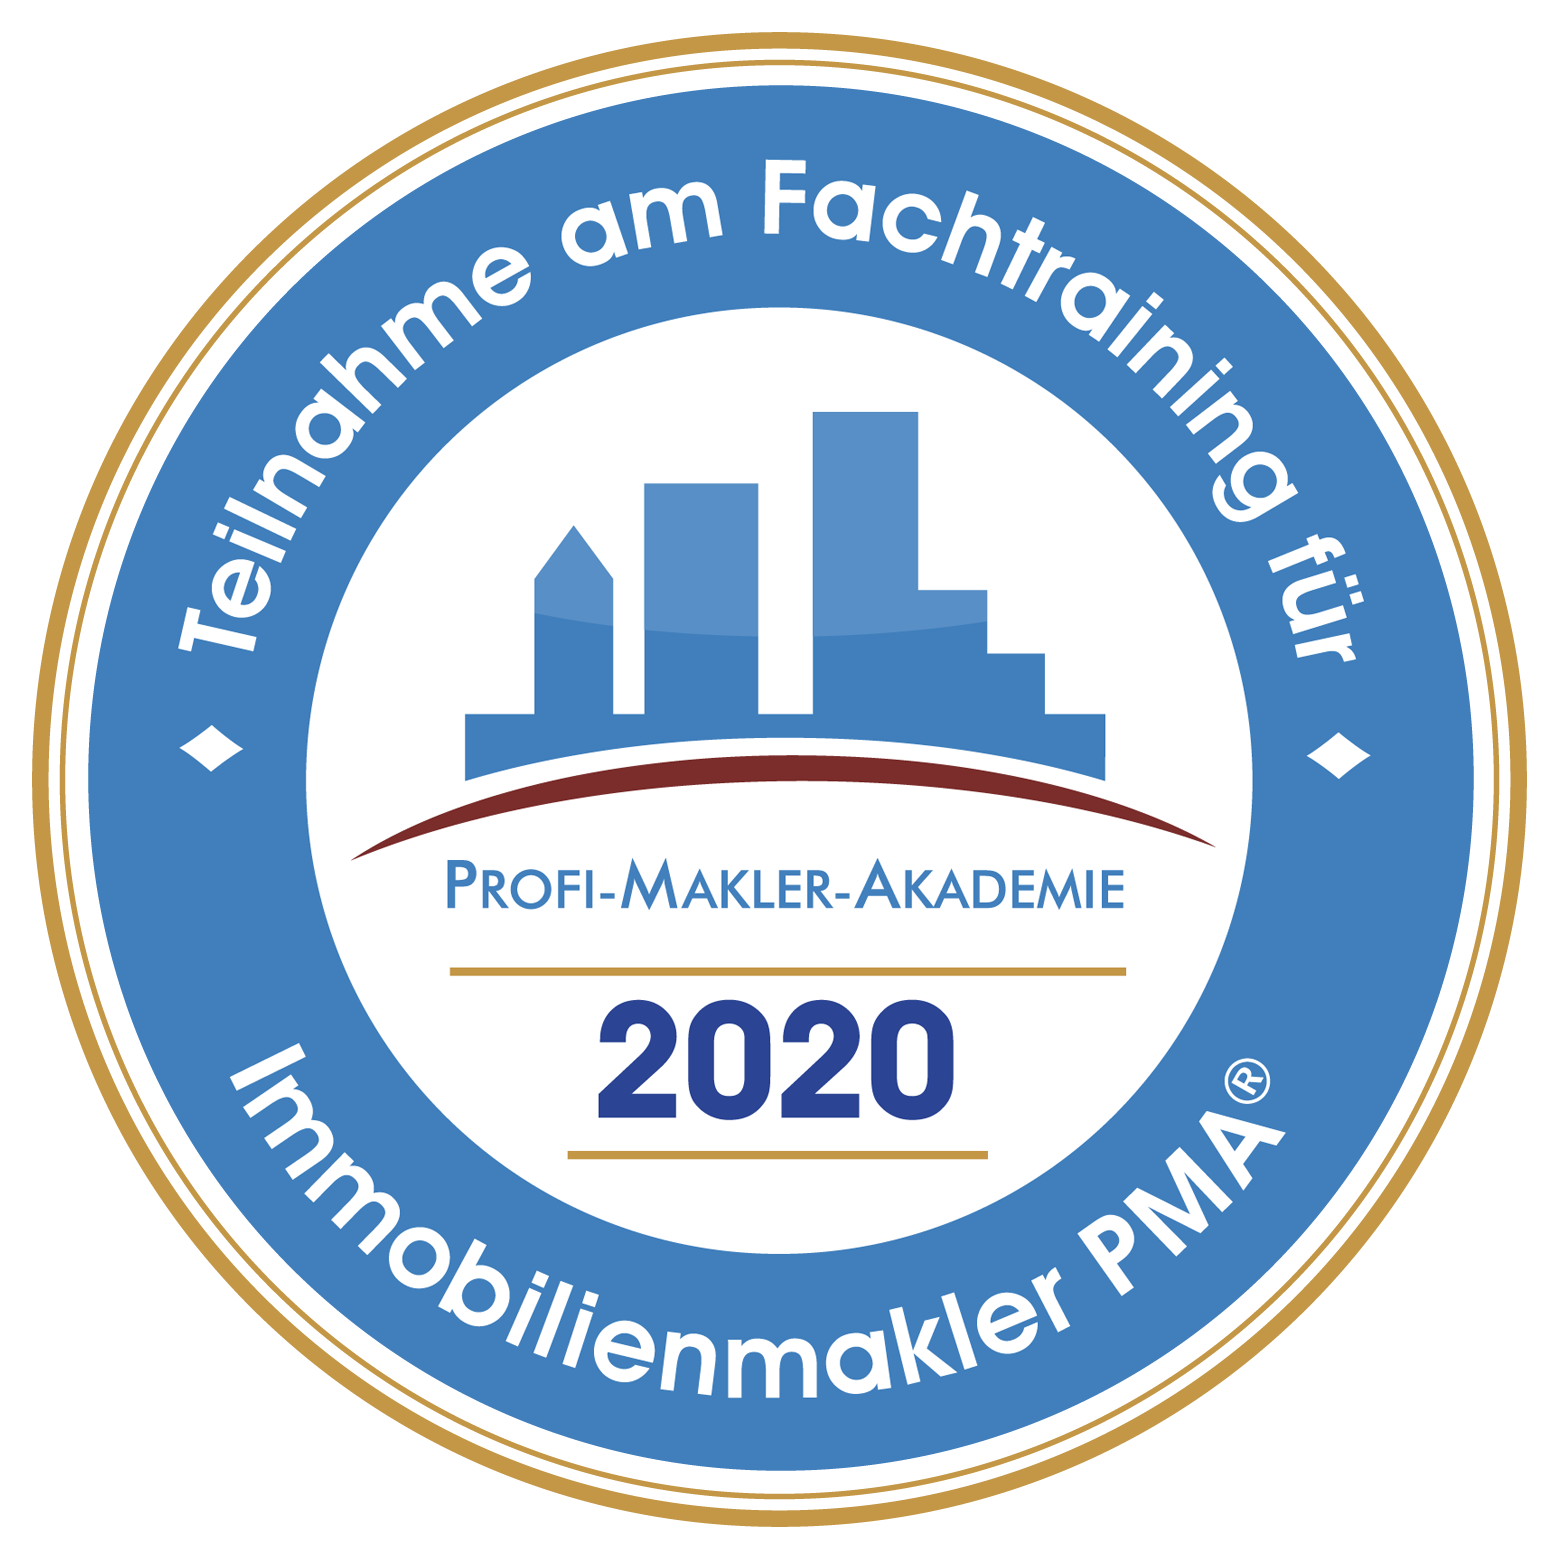 PMA Fachtraining 2020